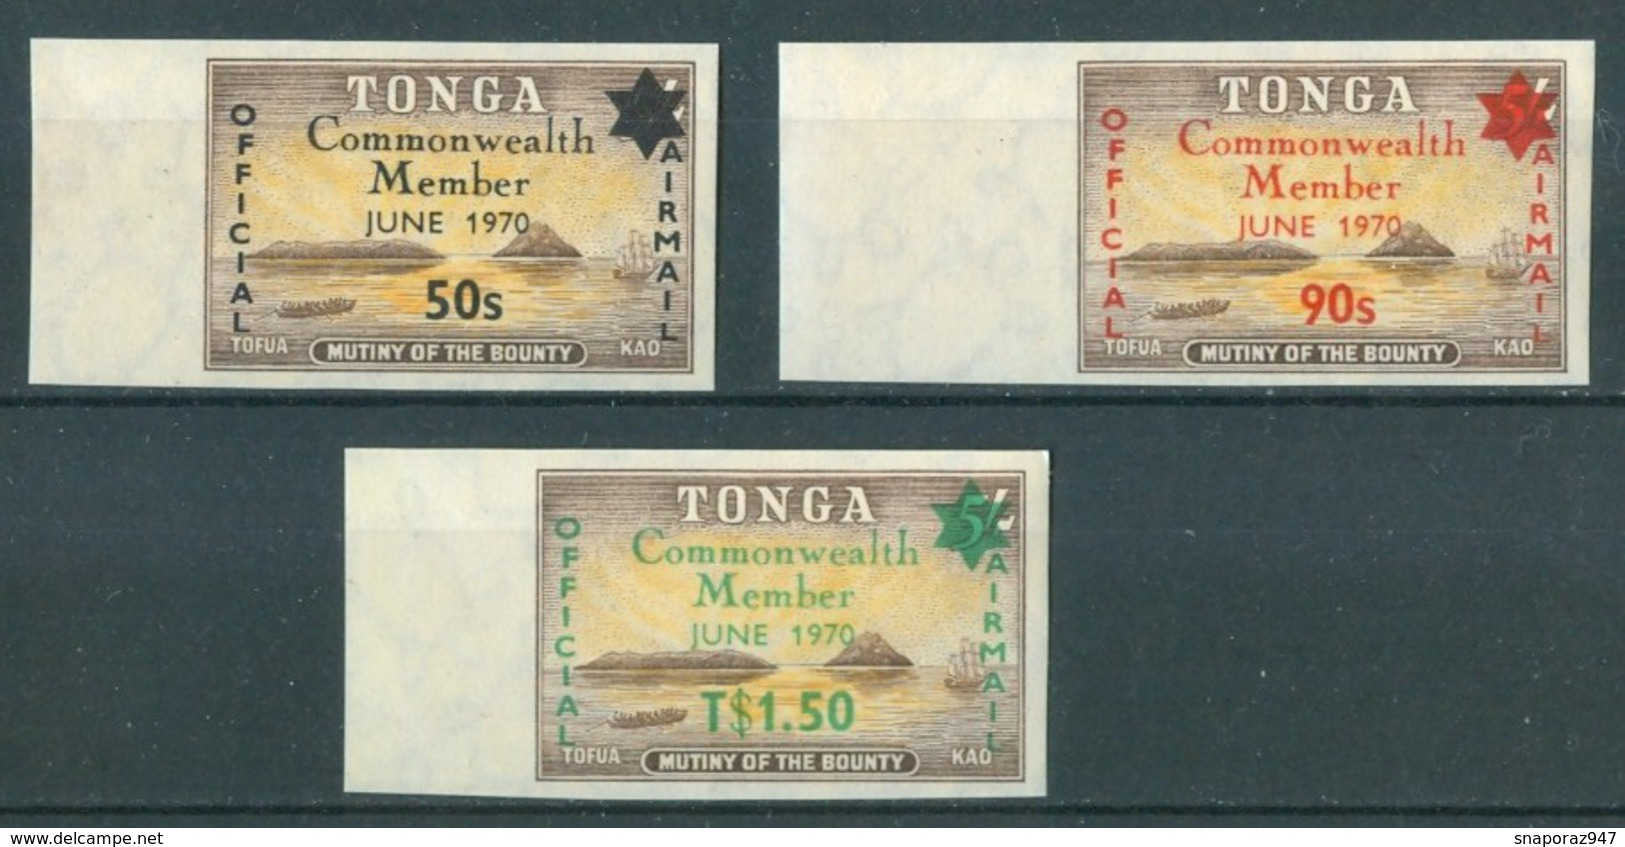 1970 Tonga Indipendence Adhesives Airmail + Air Service Set ** - Tonga (1970-...)